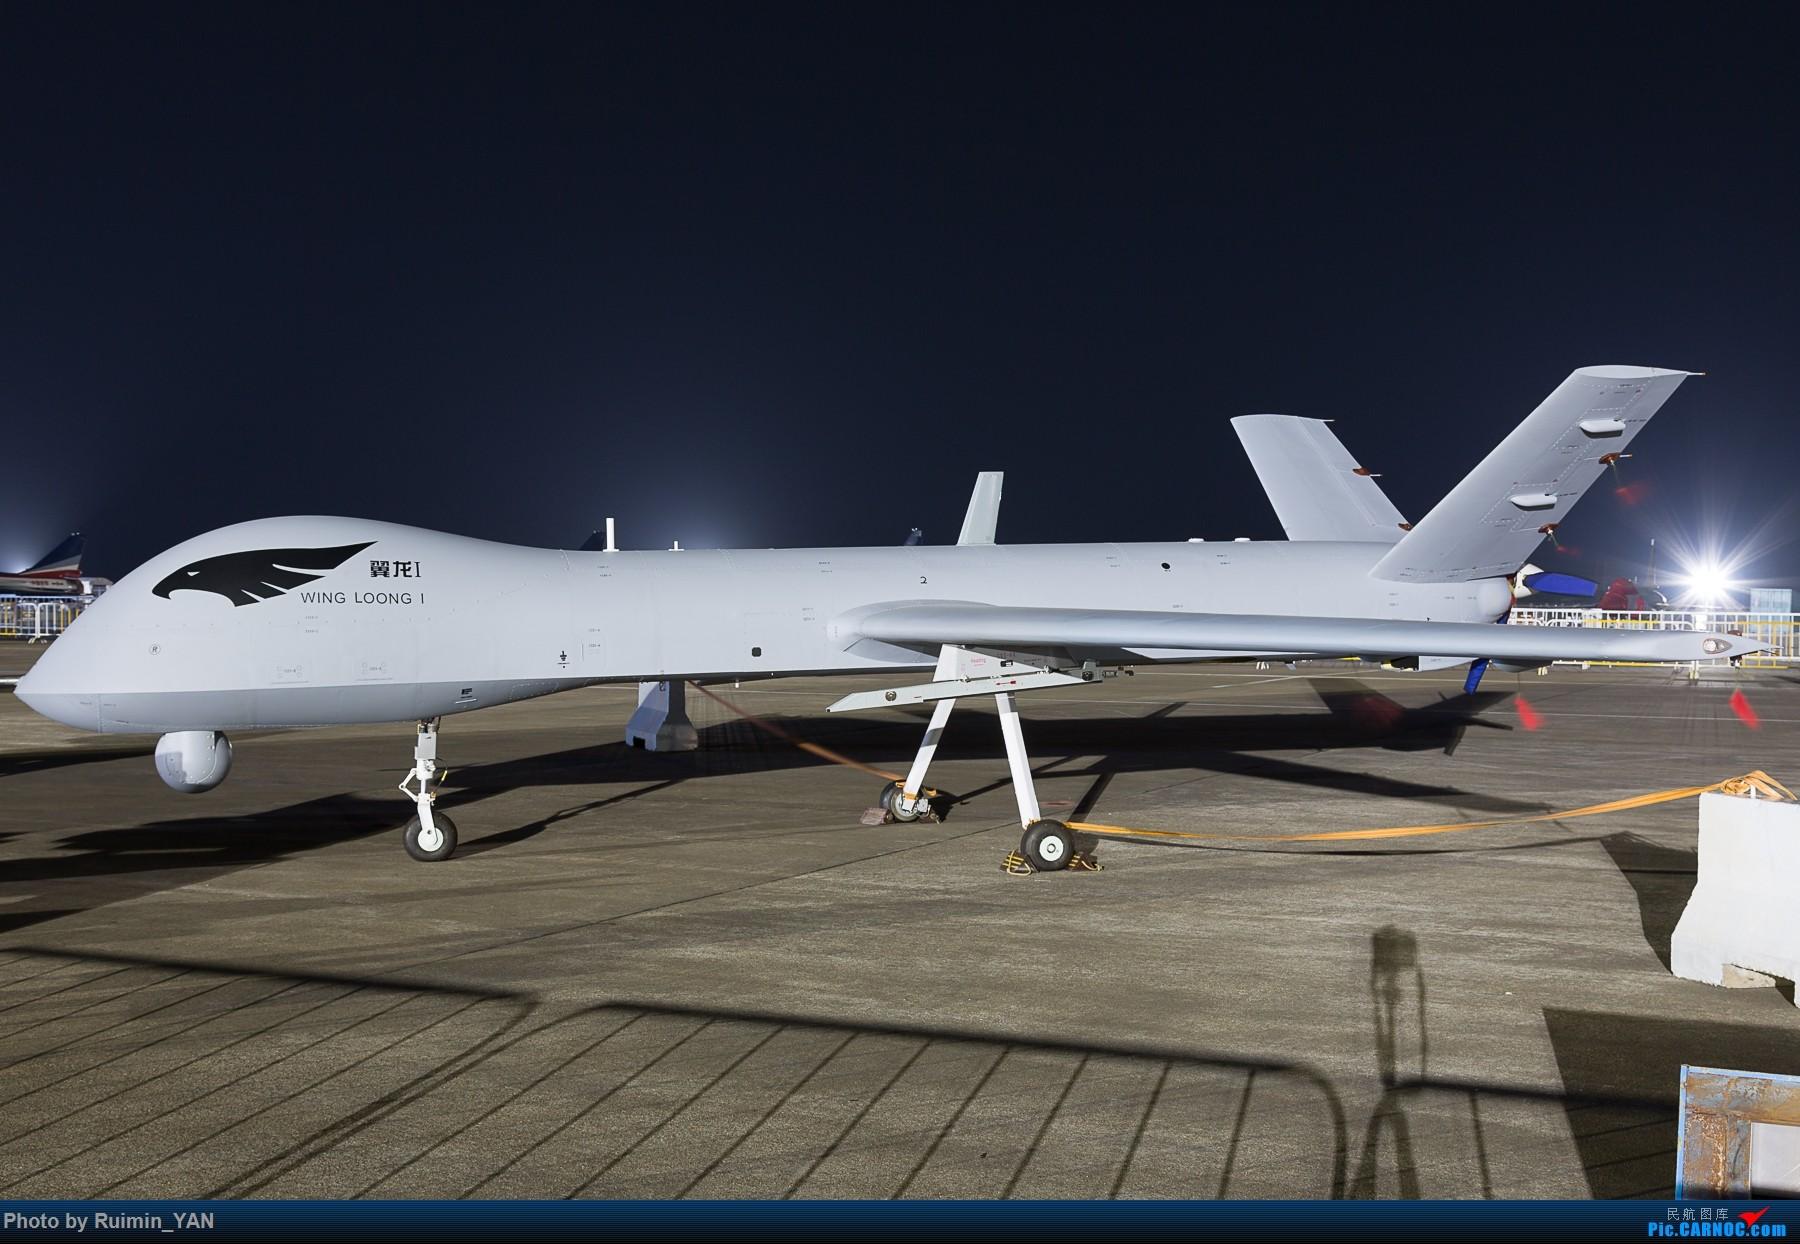 wing loong i wing loong i 中国珠海金湾机场